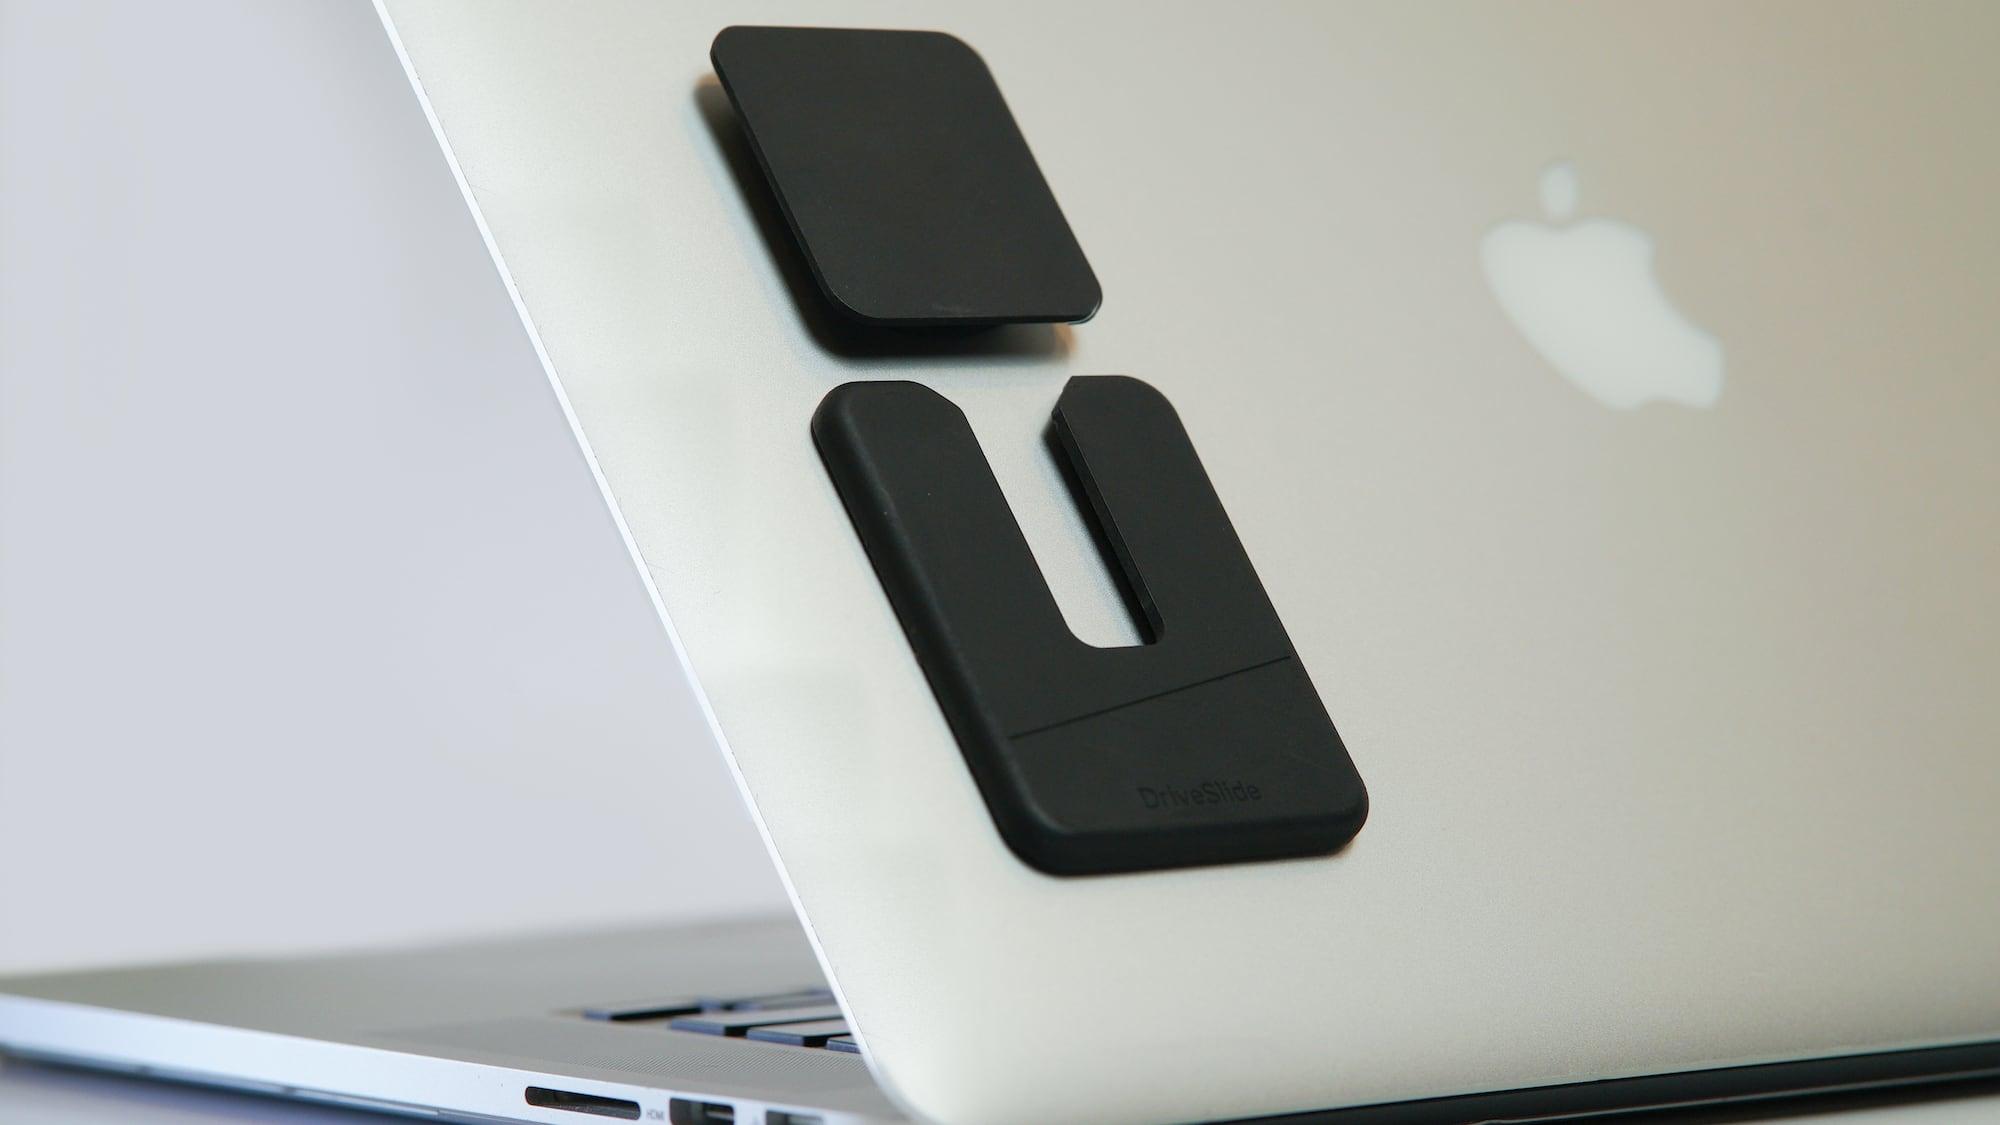 DriveSlide Hard Drive and Hub Holder